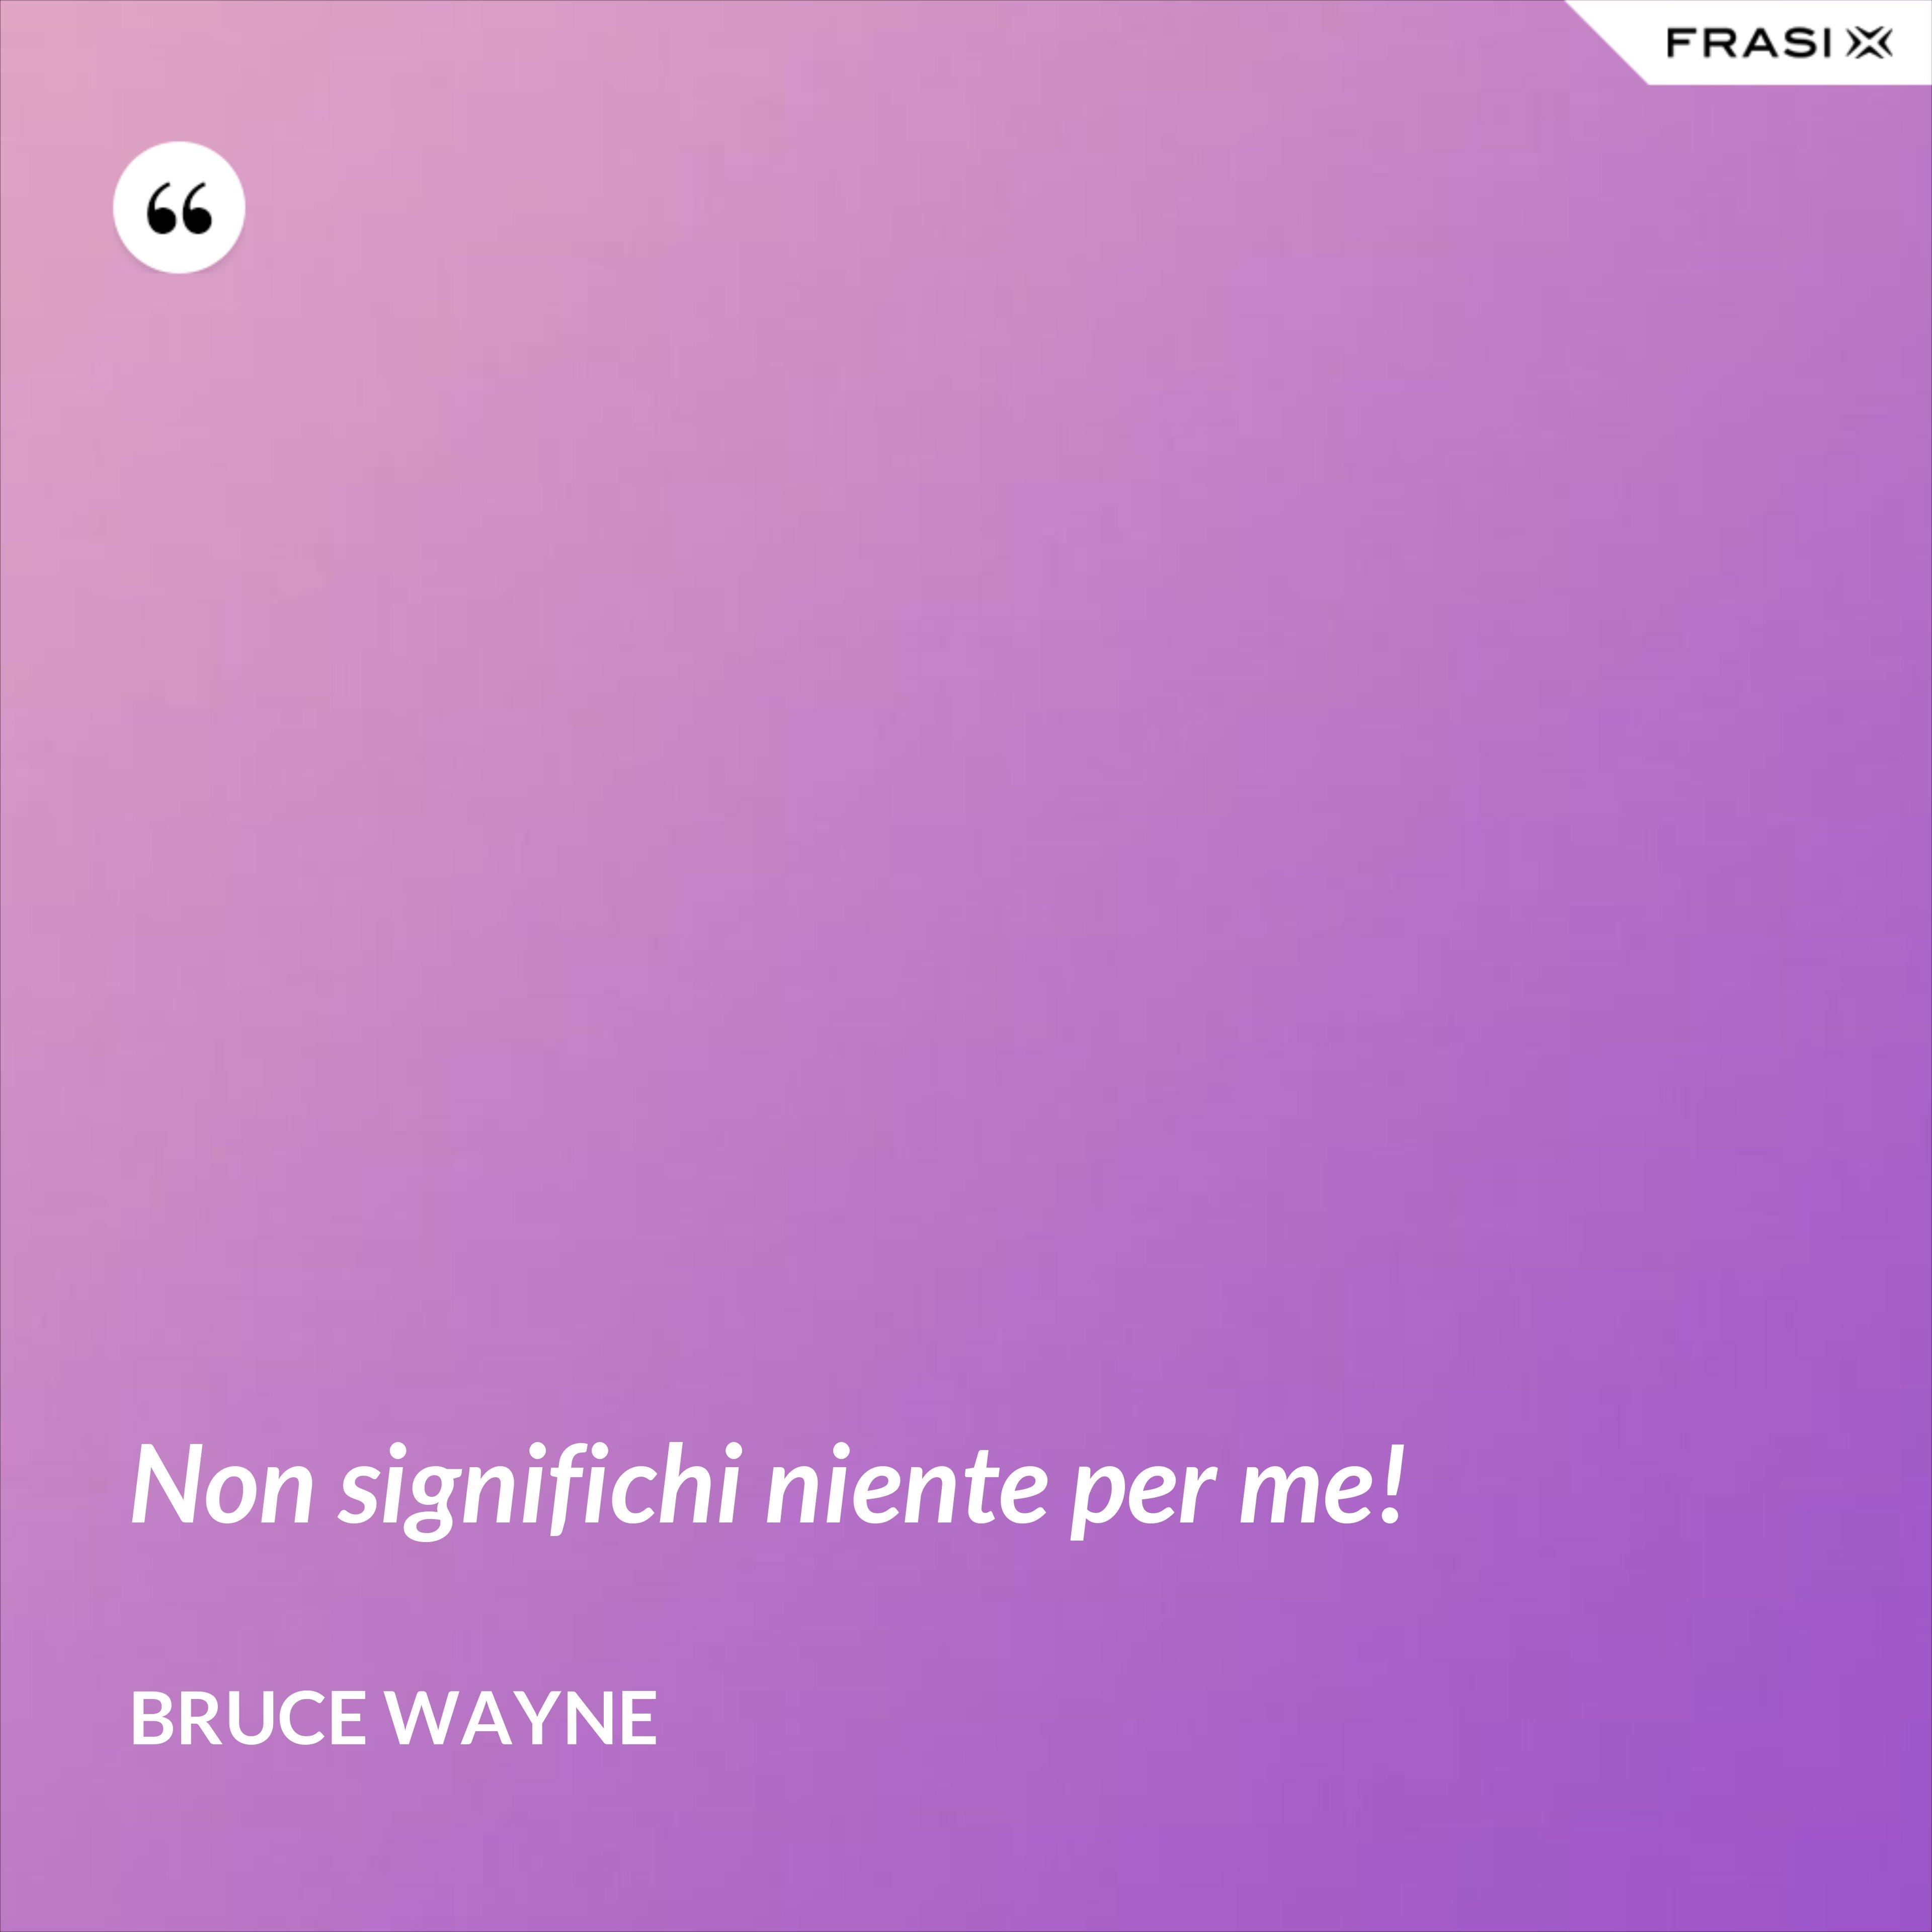 Non significhi niente per me! - Bruce Wayne